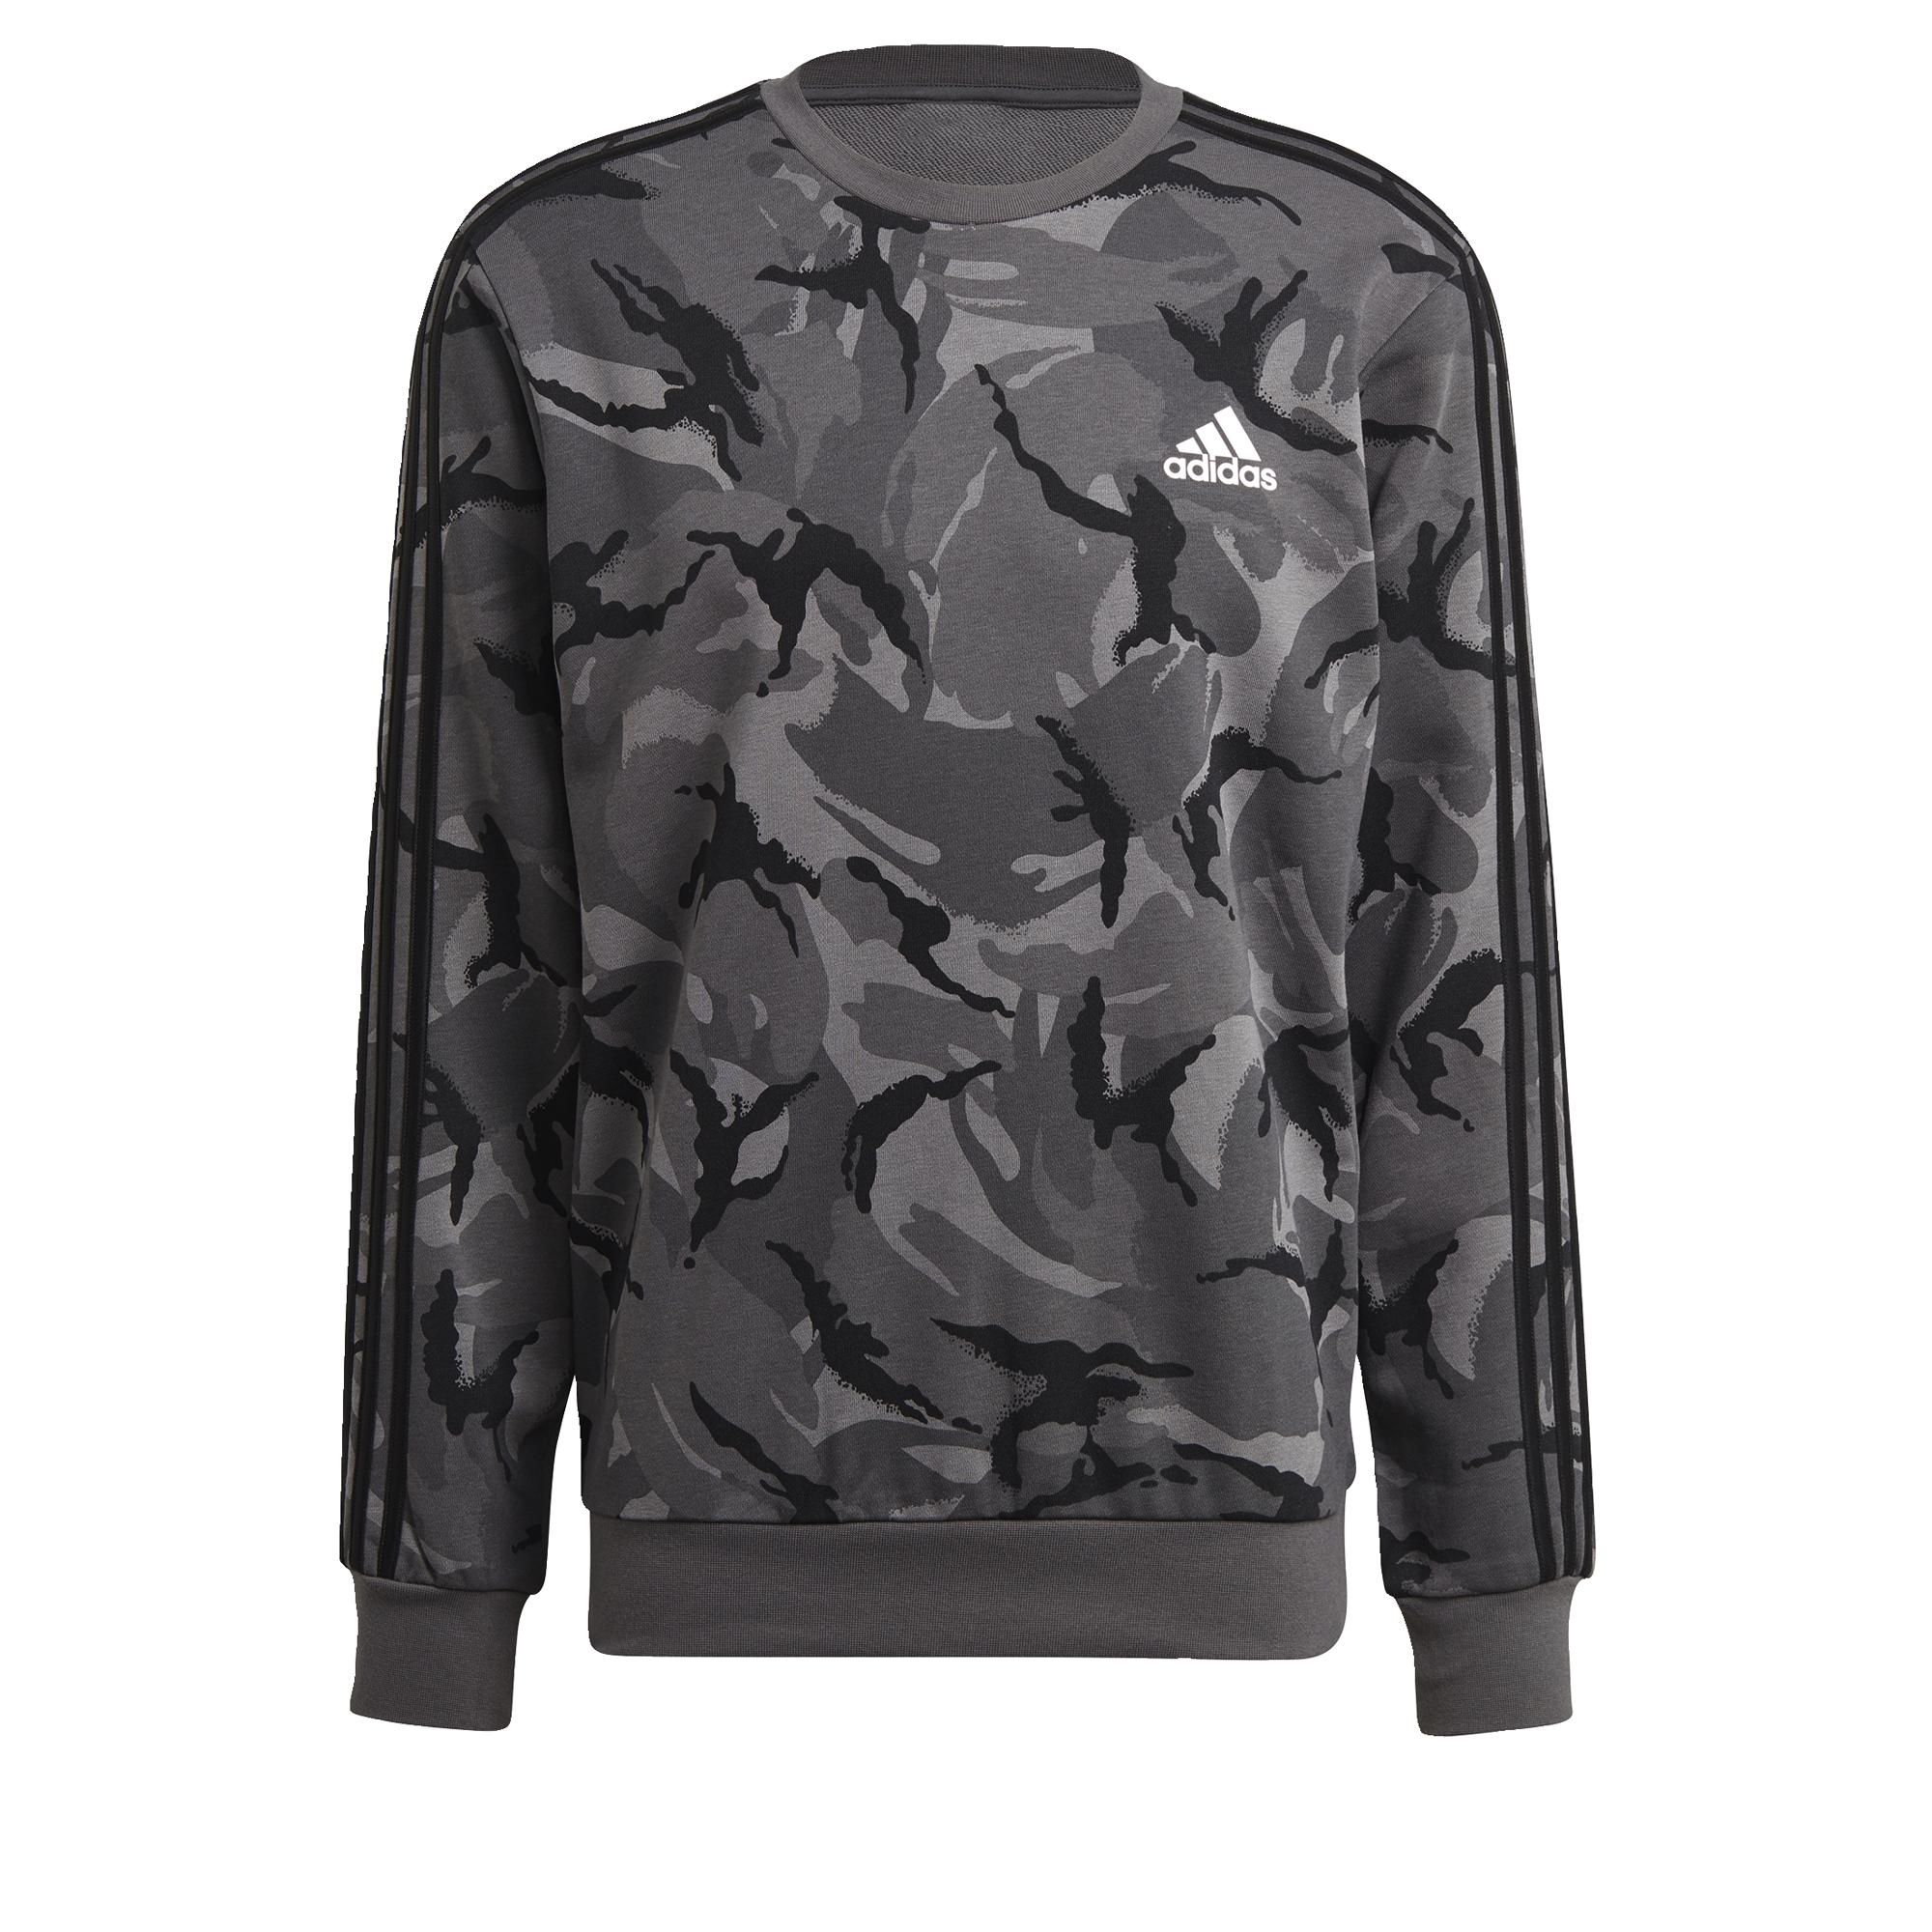 thumbnail 18 - adidas Essentials Camouflage Crew Sweatshirt Men's Sweatshirts